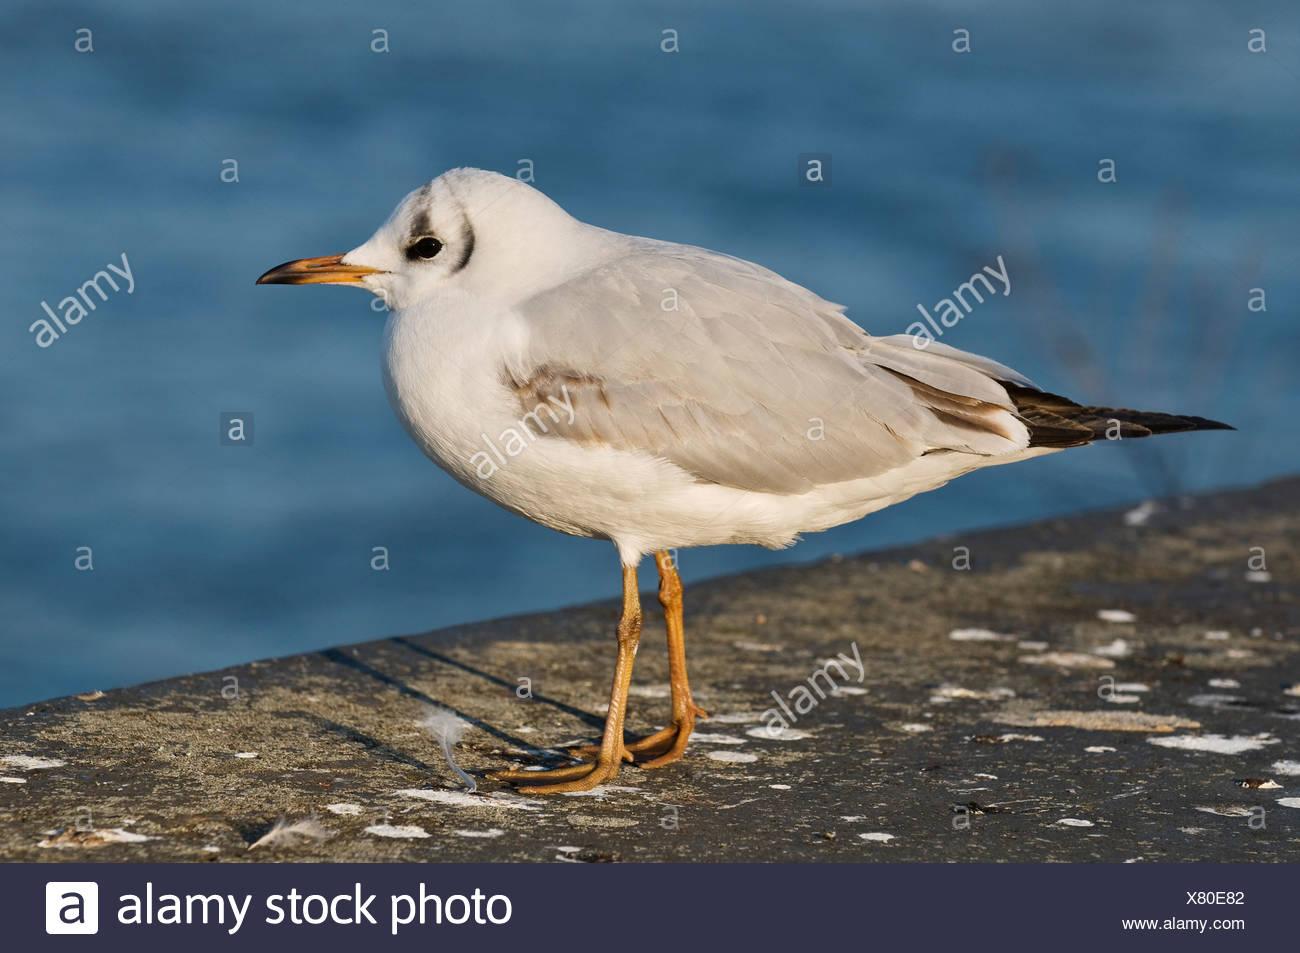 Black-headed gull (Larus ridibundus), immature, first winter, Bonn, North Rhine-Westphalia, Germany, Europe - Stock Image